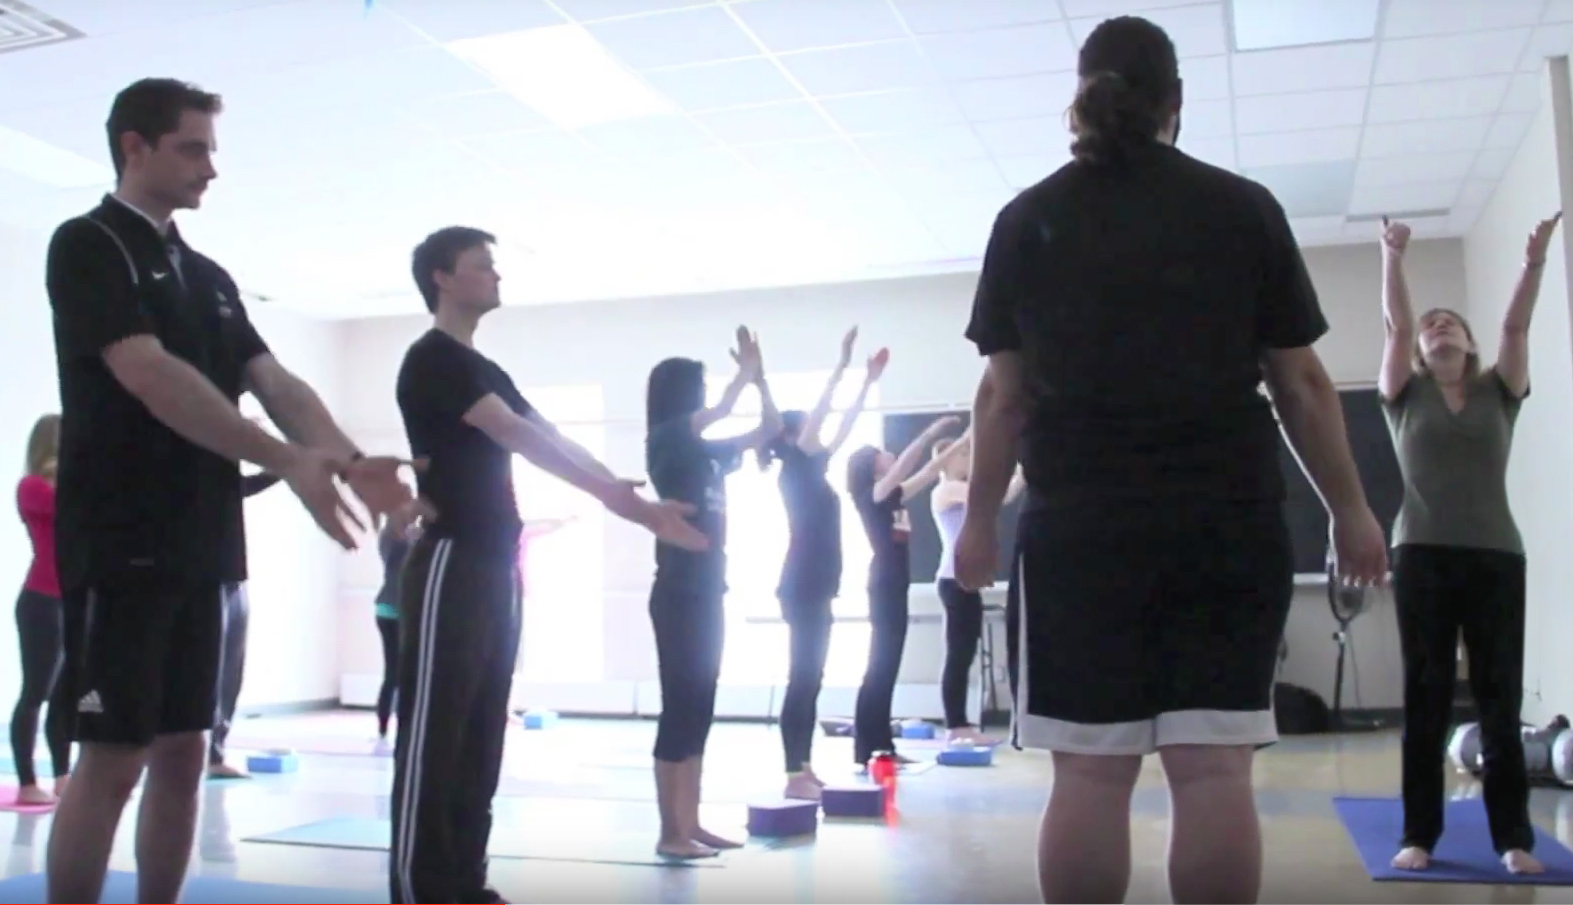 Kaia's yoga class